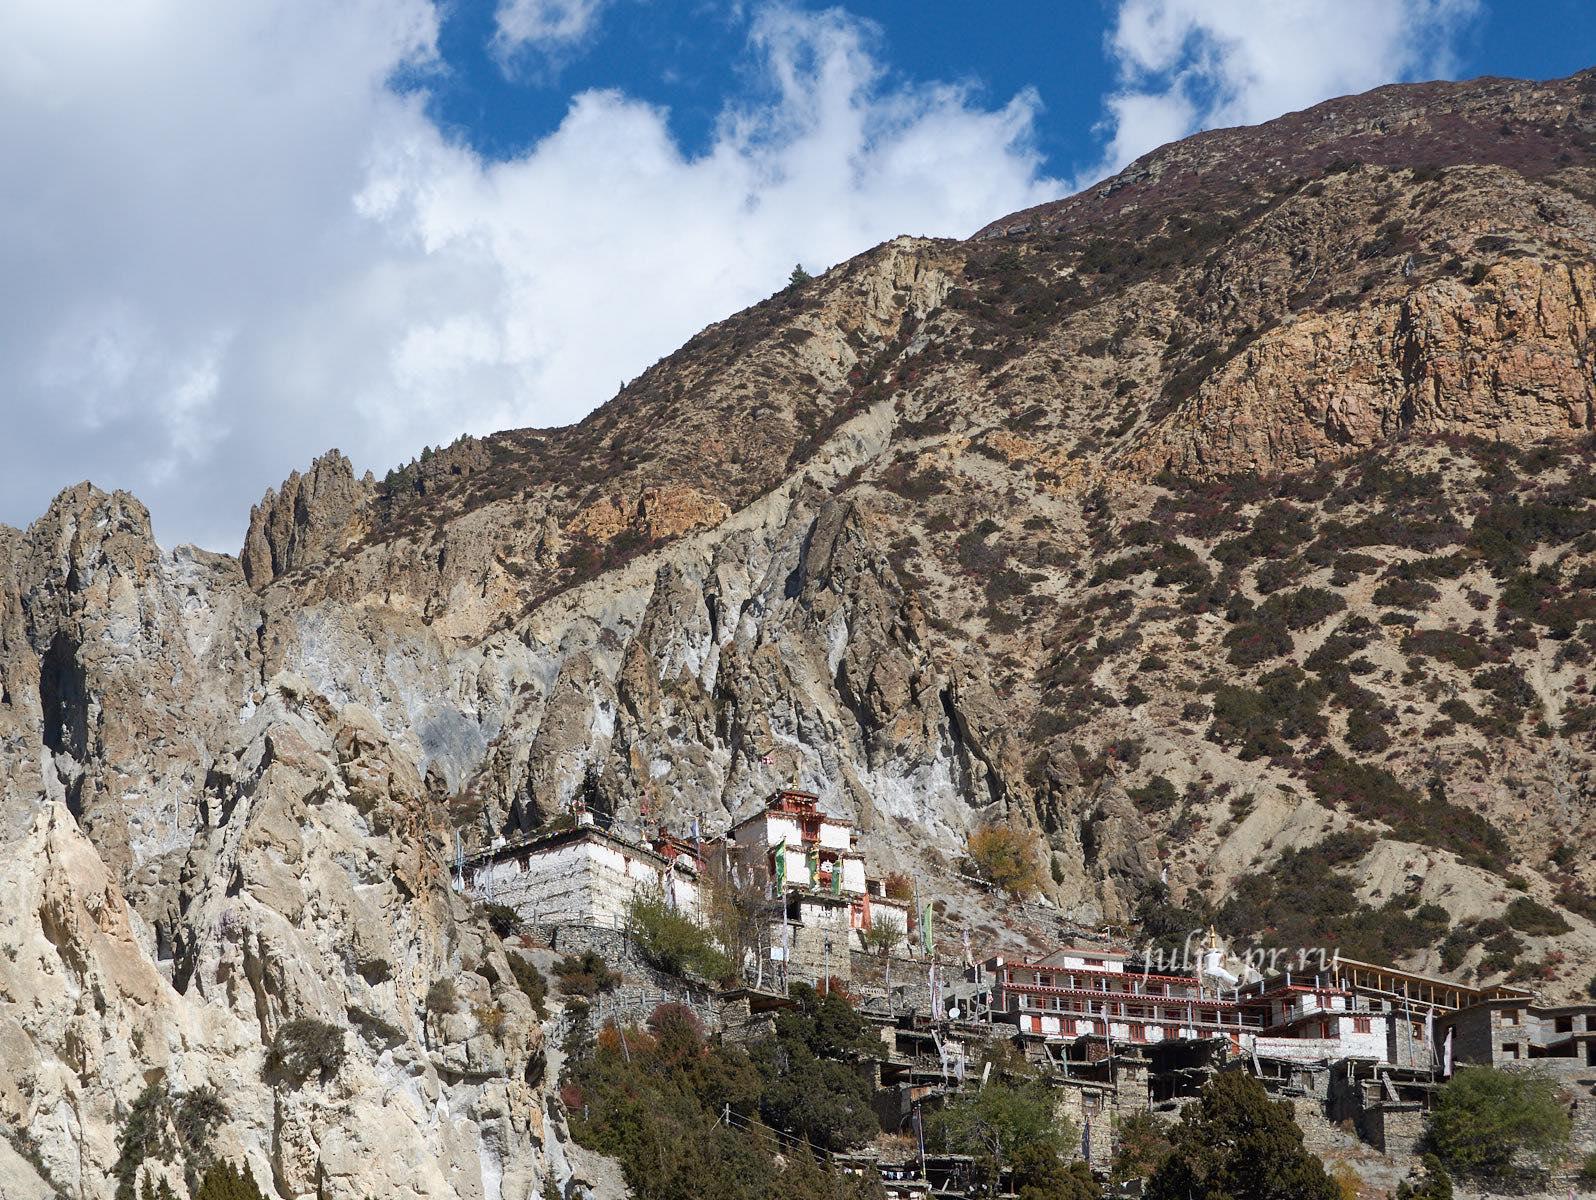 Непал, Трек вокруг Аннапурны, Braga, Монастырь